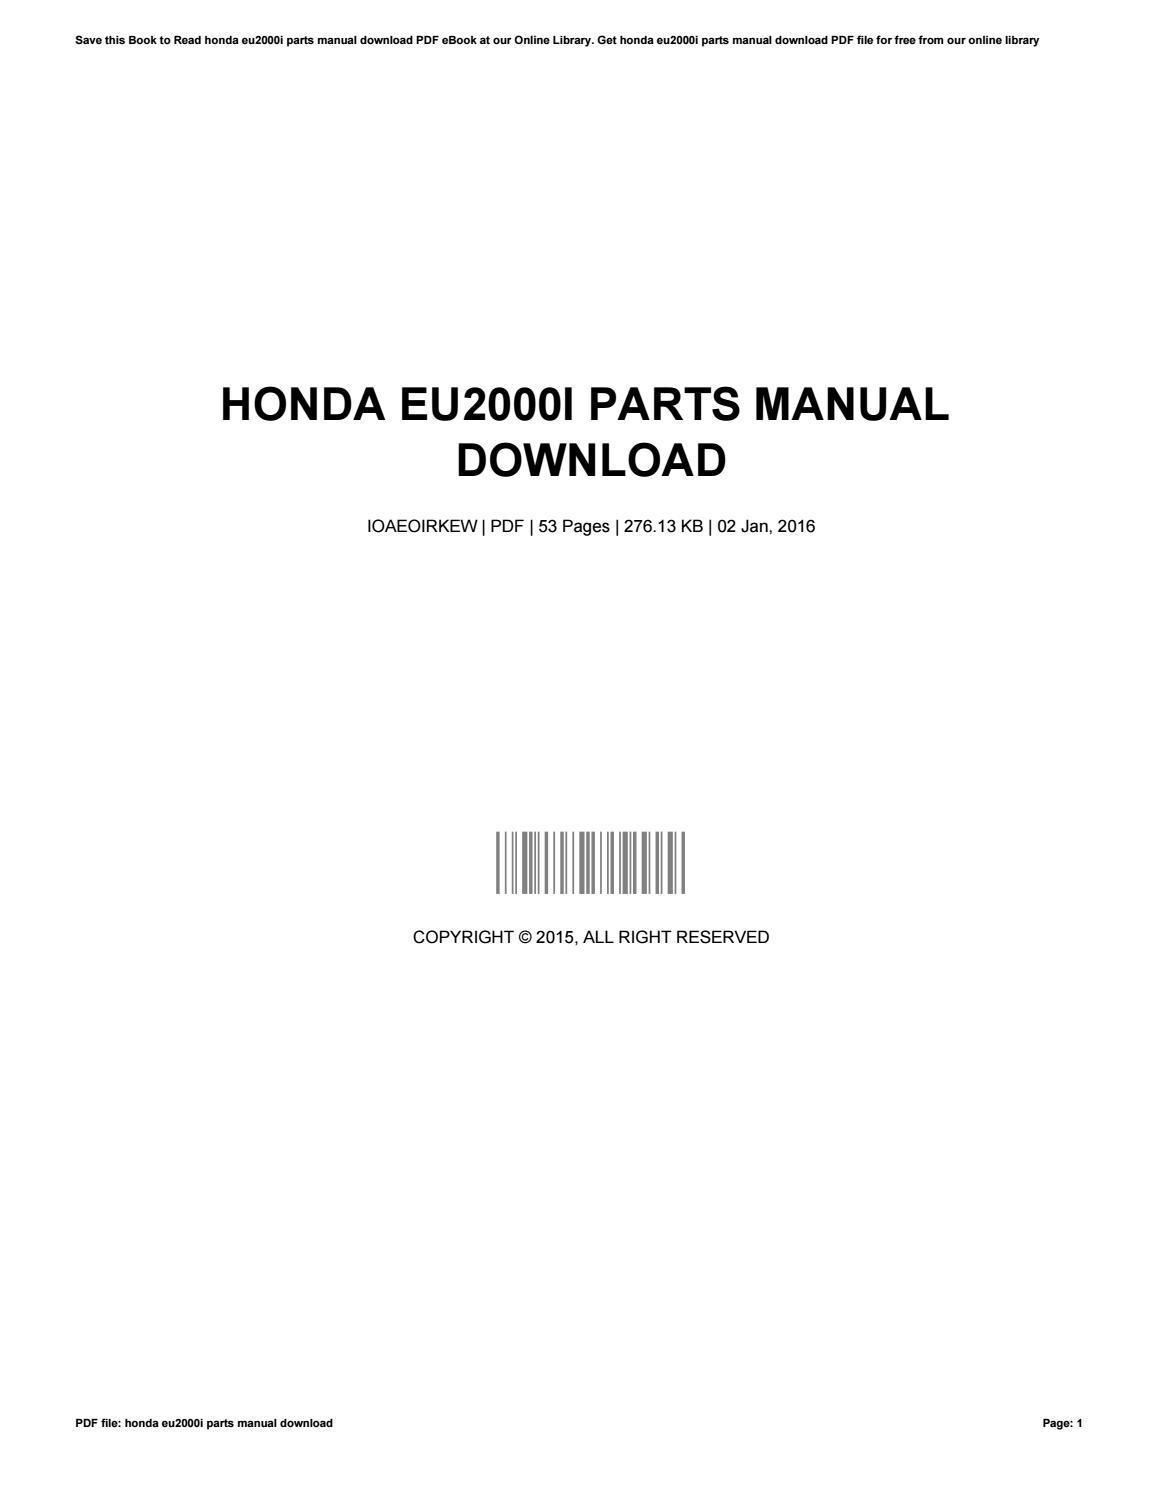 Miraculous Honda Eu2000I Parts Manual Download By 50Mb347 Issuu Wiring Digital Resources Instshebarightsorg